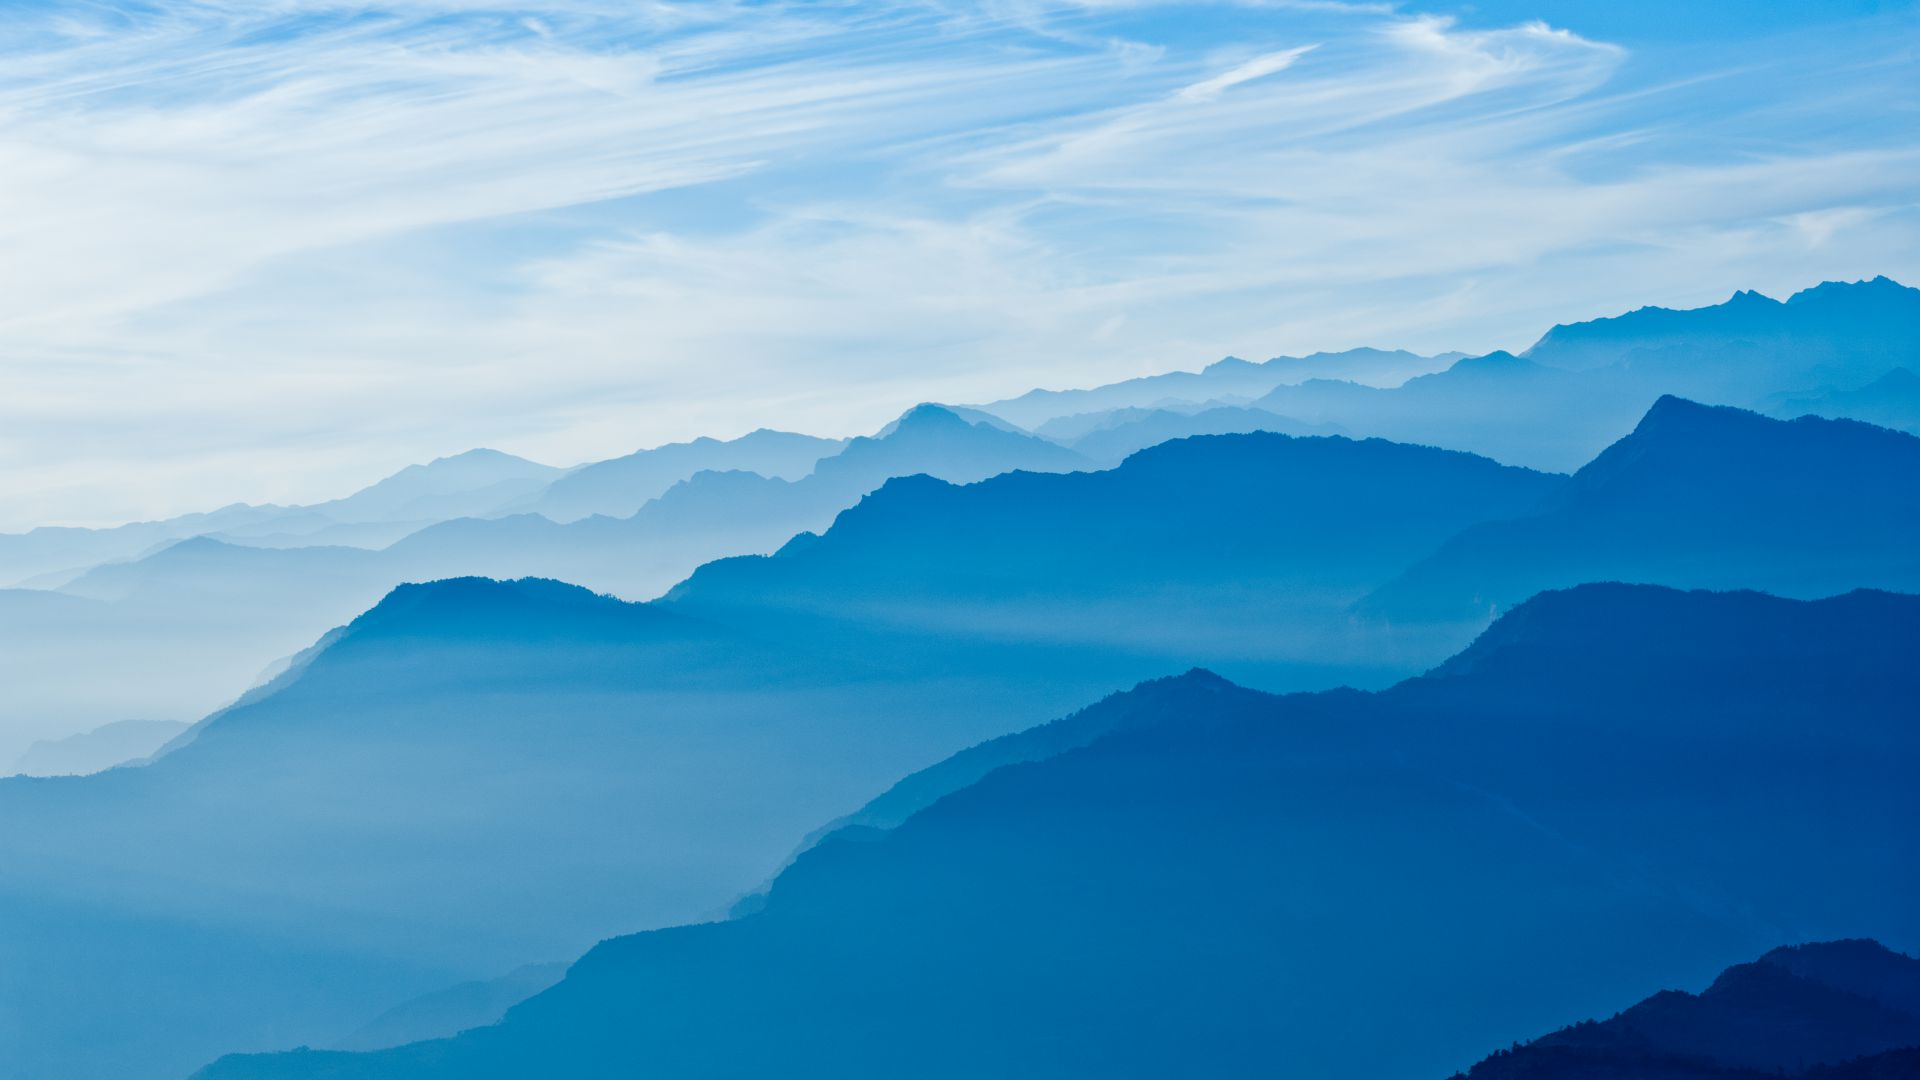 Wallpaper himalayas 5k 4k wallpaper nepal mountains for Wallpaper home 5k